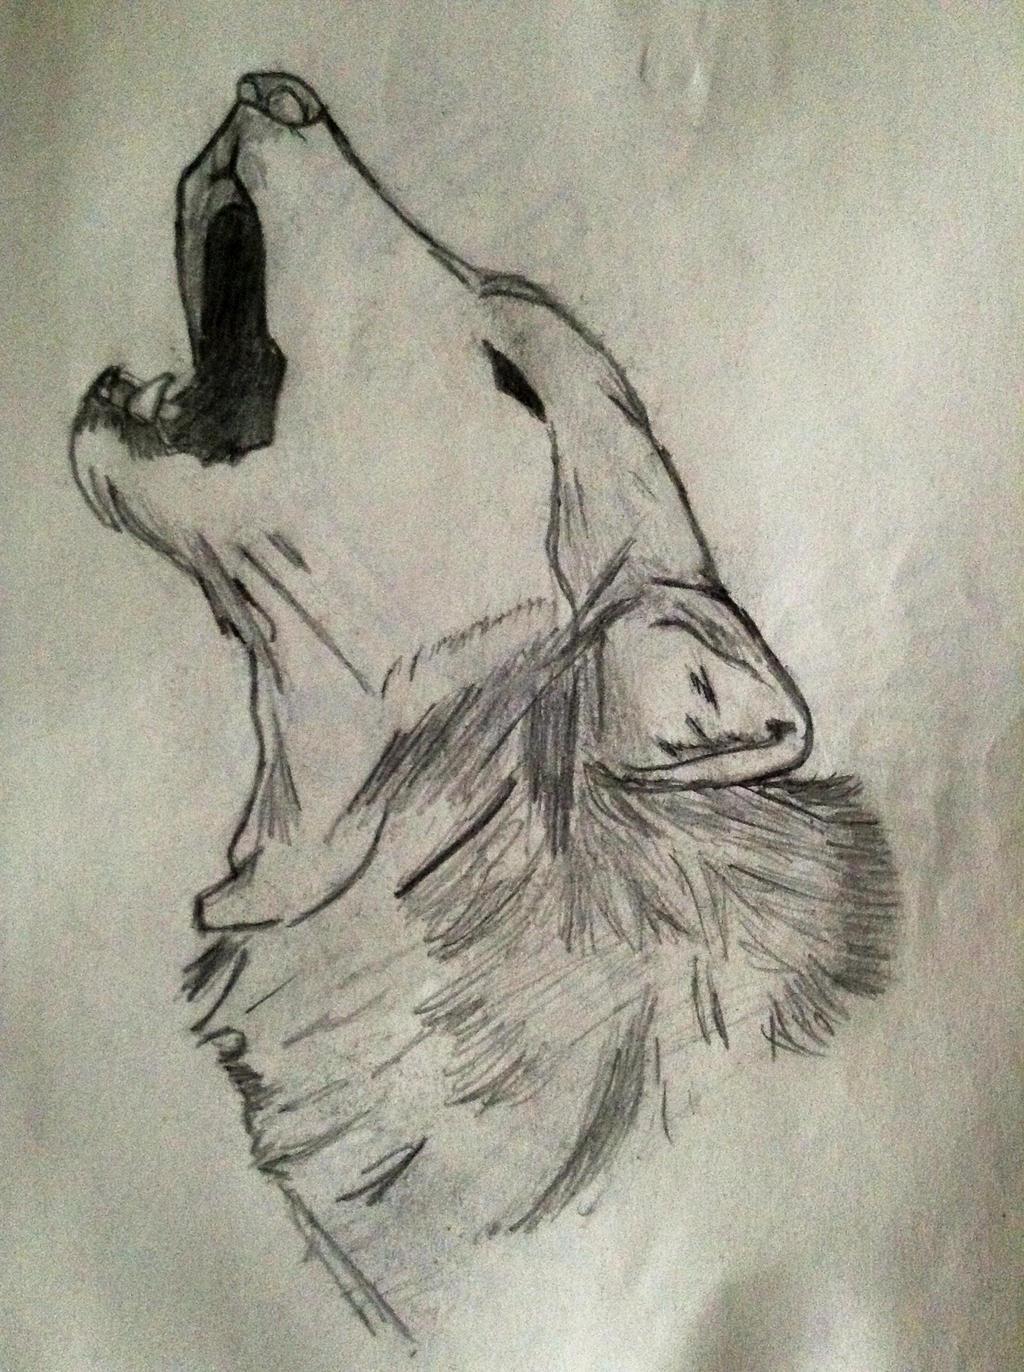 Howling Wolf Head Sketch by bloodwolf-34 on DeviantArt